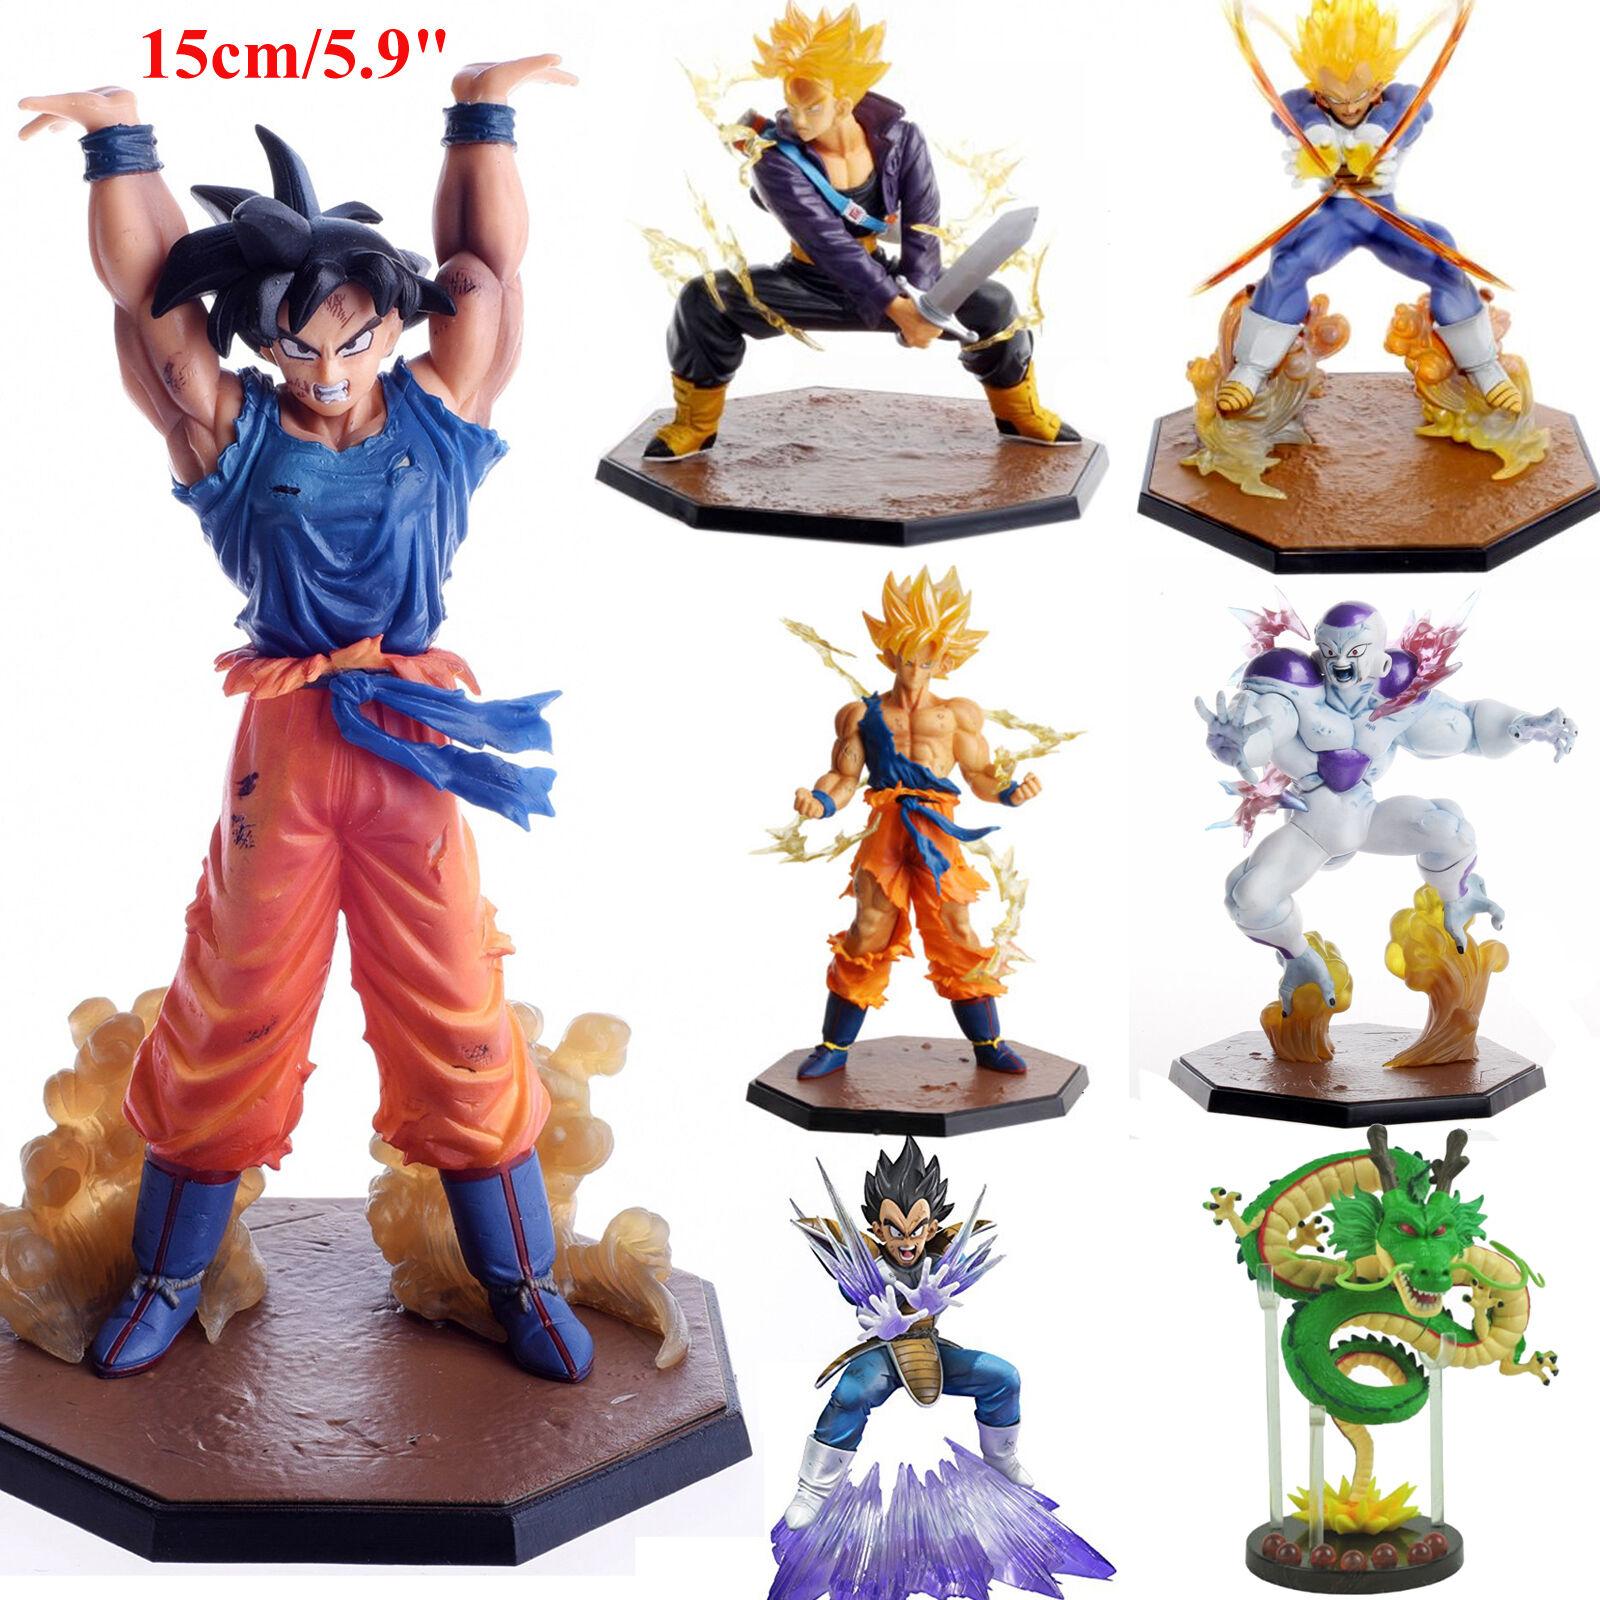 Dragon Ball Z Piccolo Figure 15cm BOXED PVC Action DragonBall Model Toys Anime